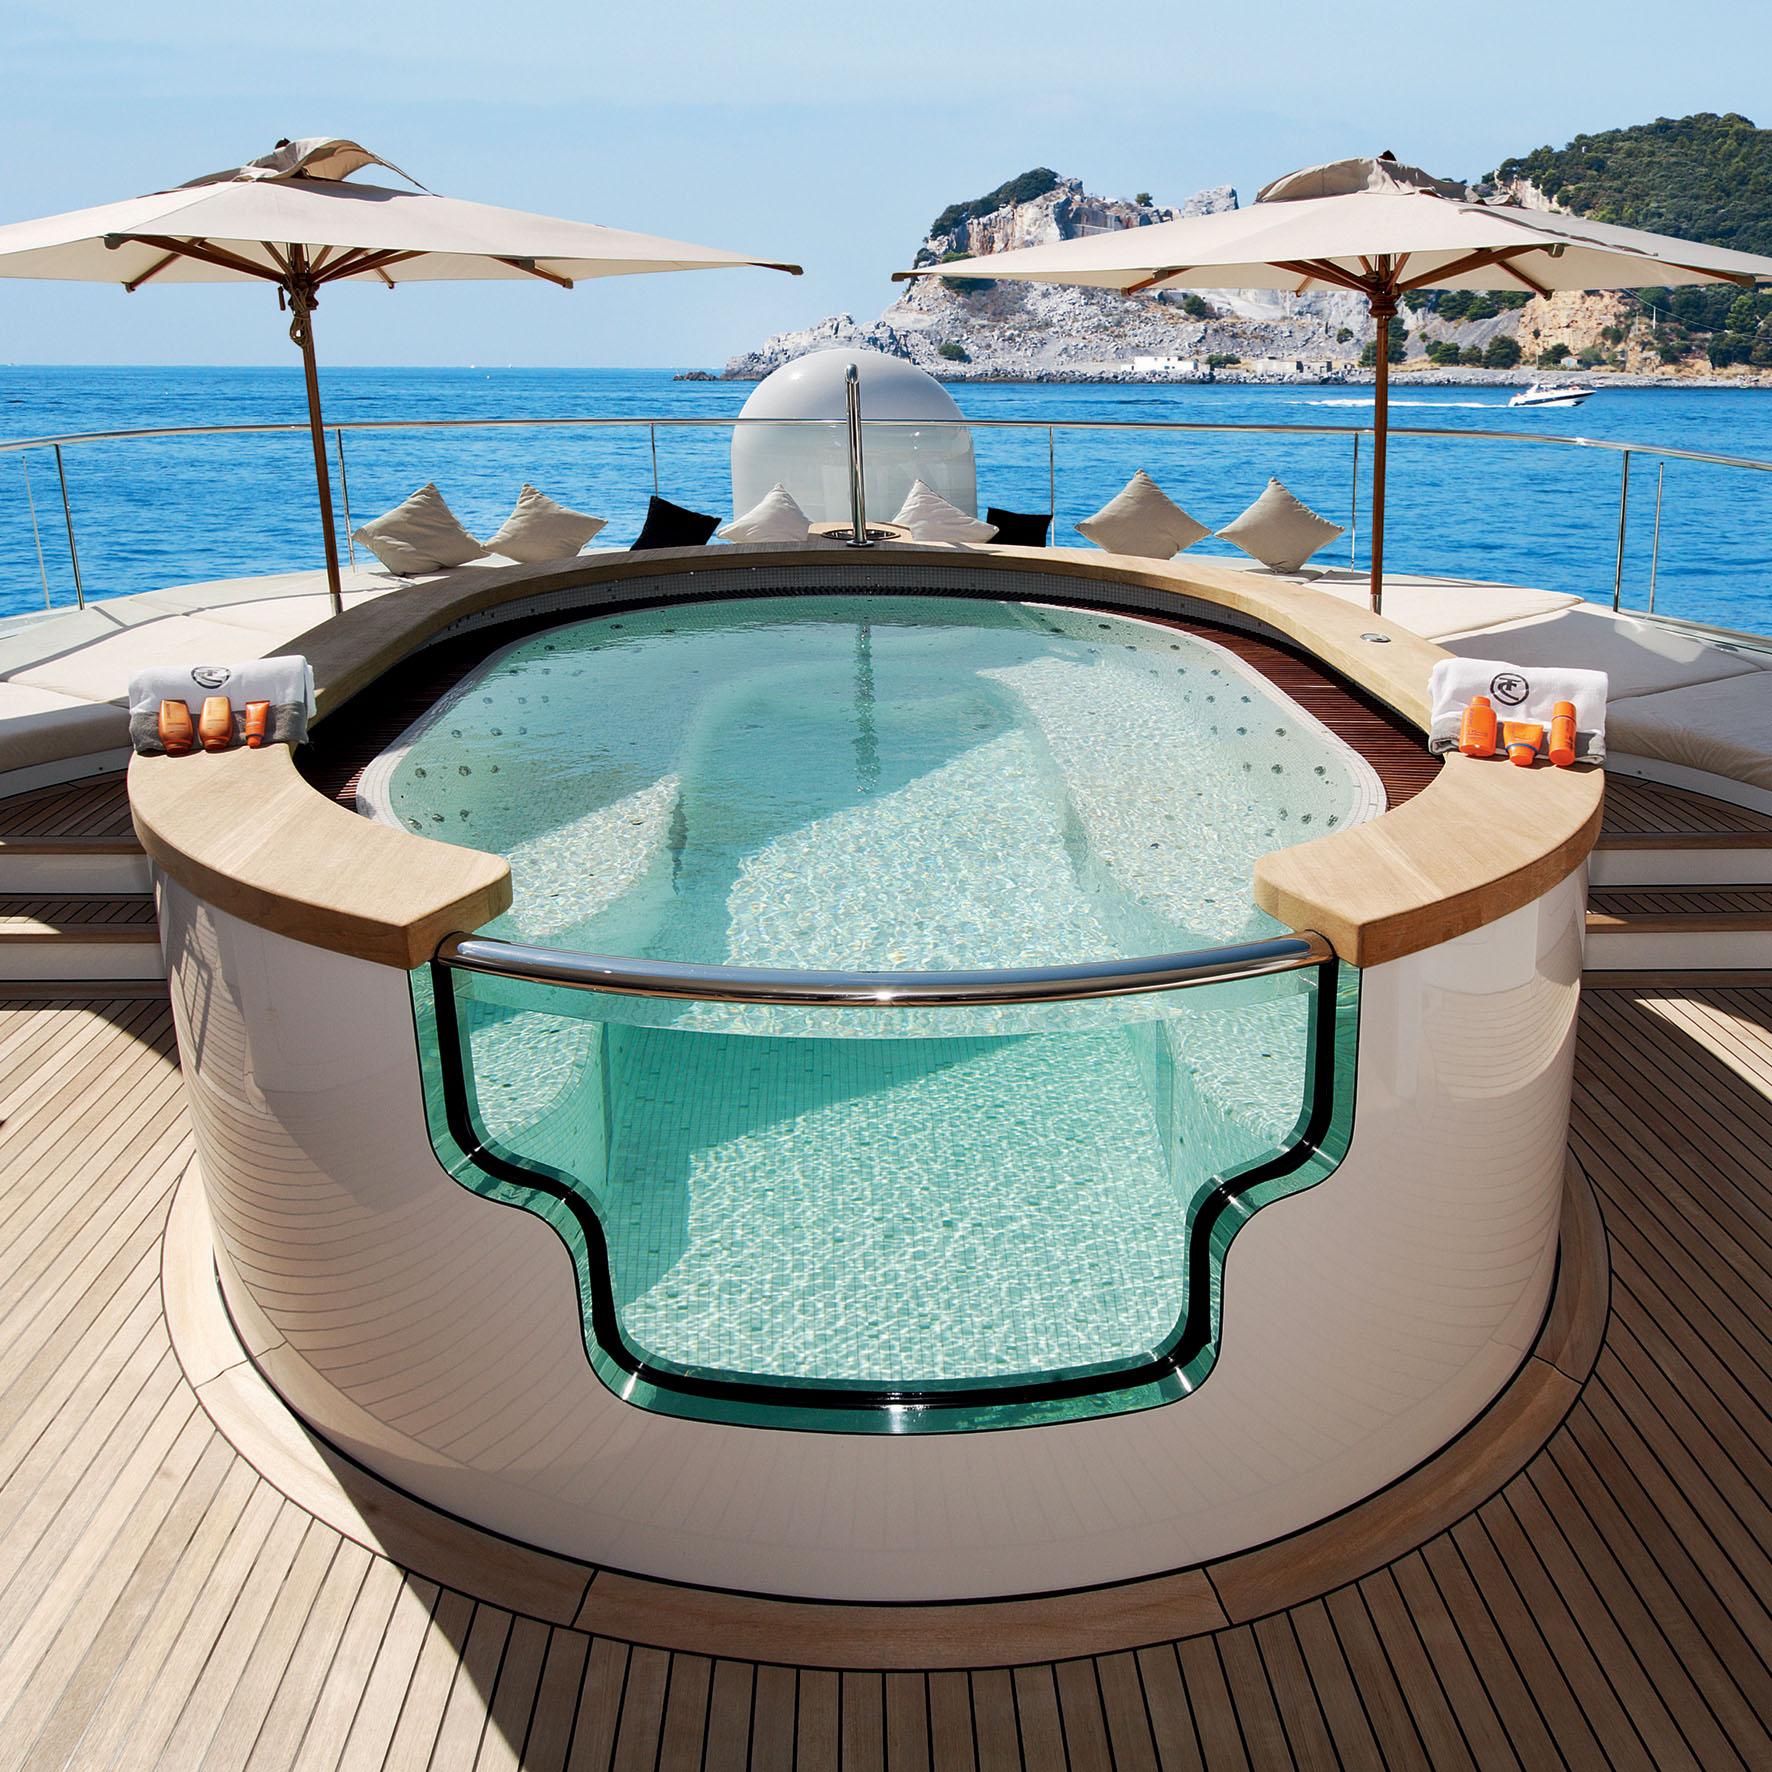 SuperyachtLife-On-The-High-Seas-Tony-Harris-Fort-Lauderdale-Venice-Magazine-3